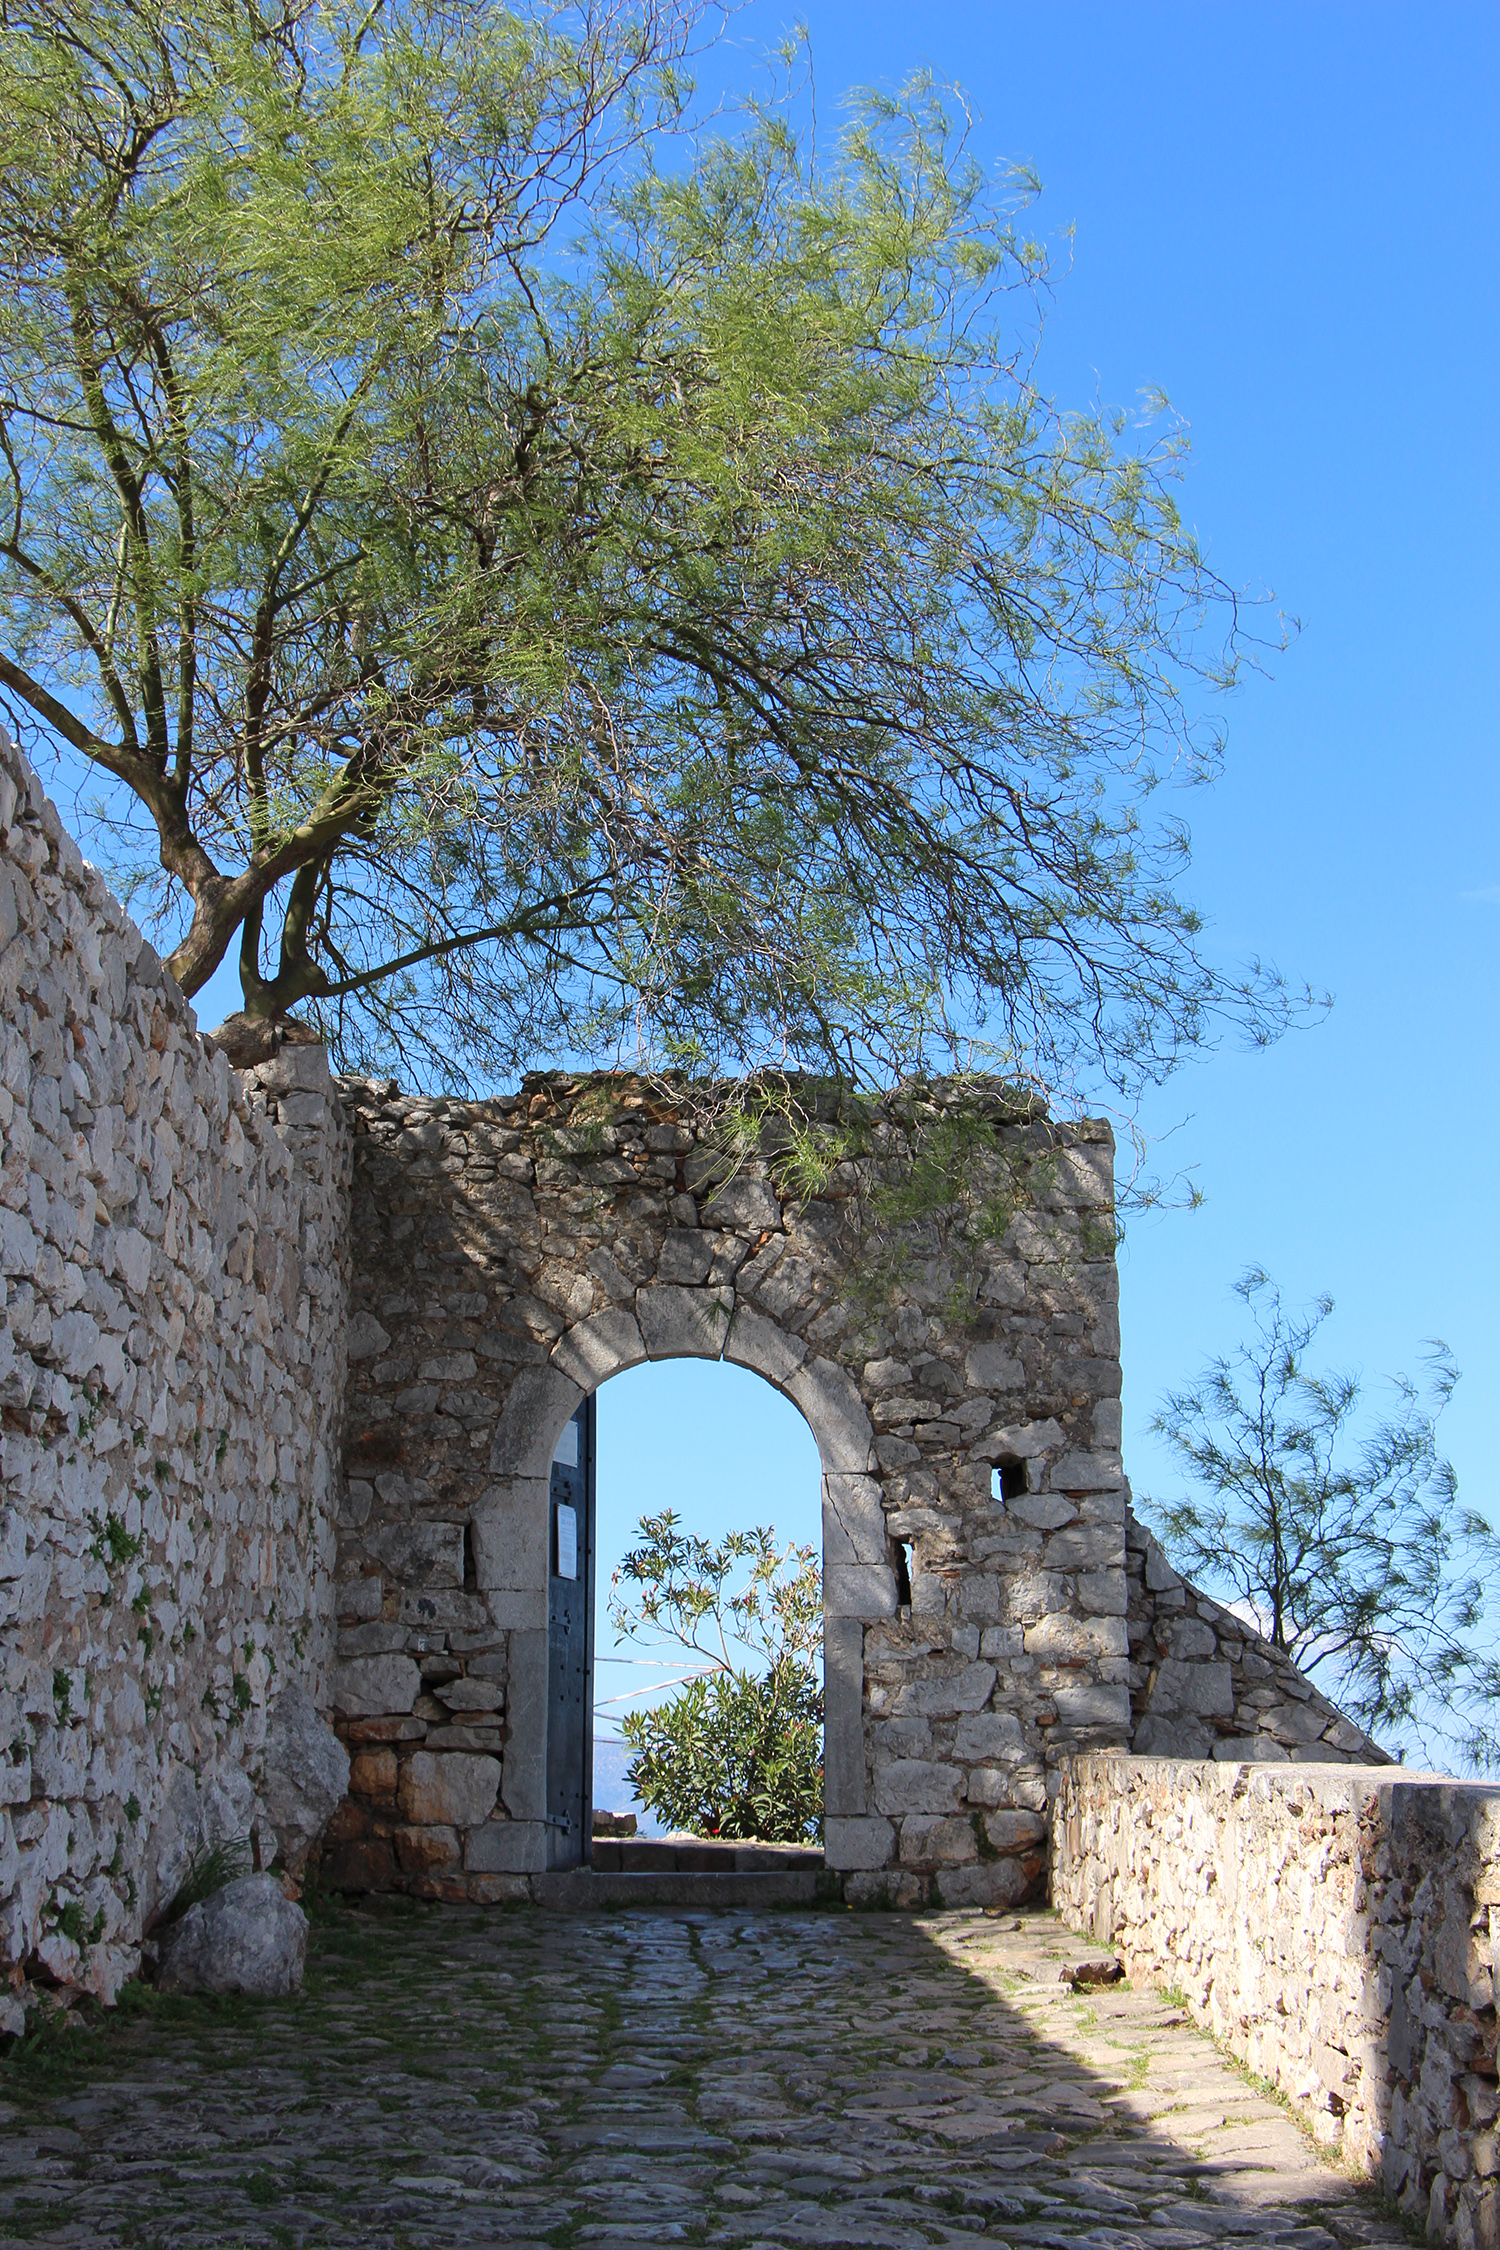 entrance to nafplio palamidi fortress shadows trees